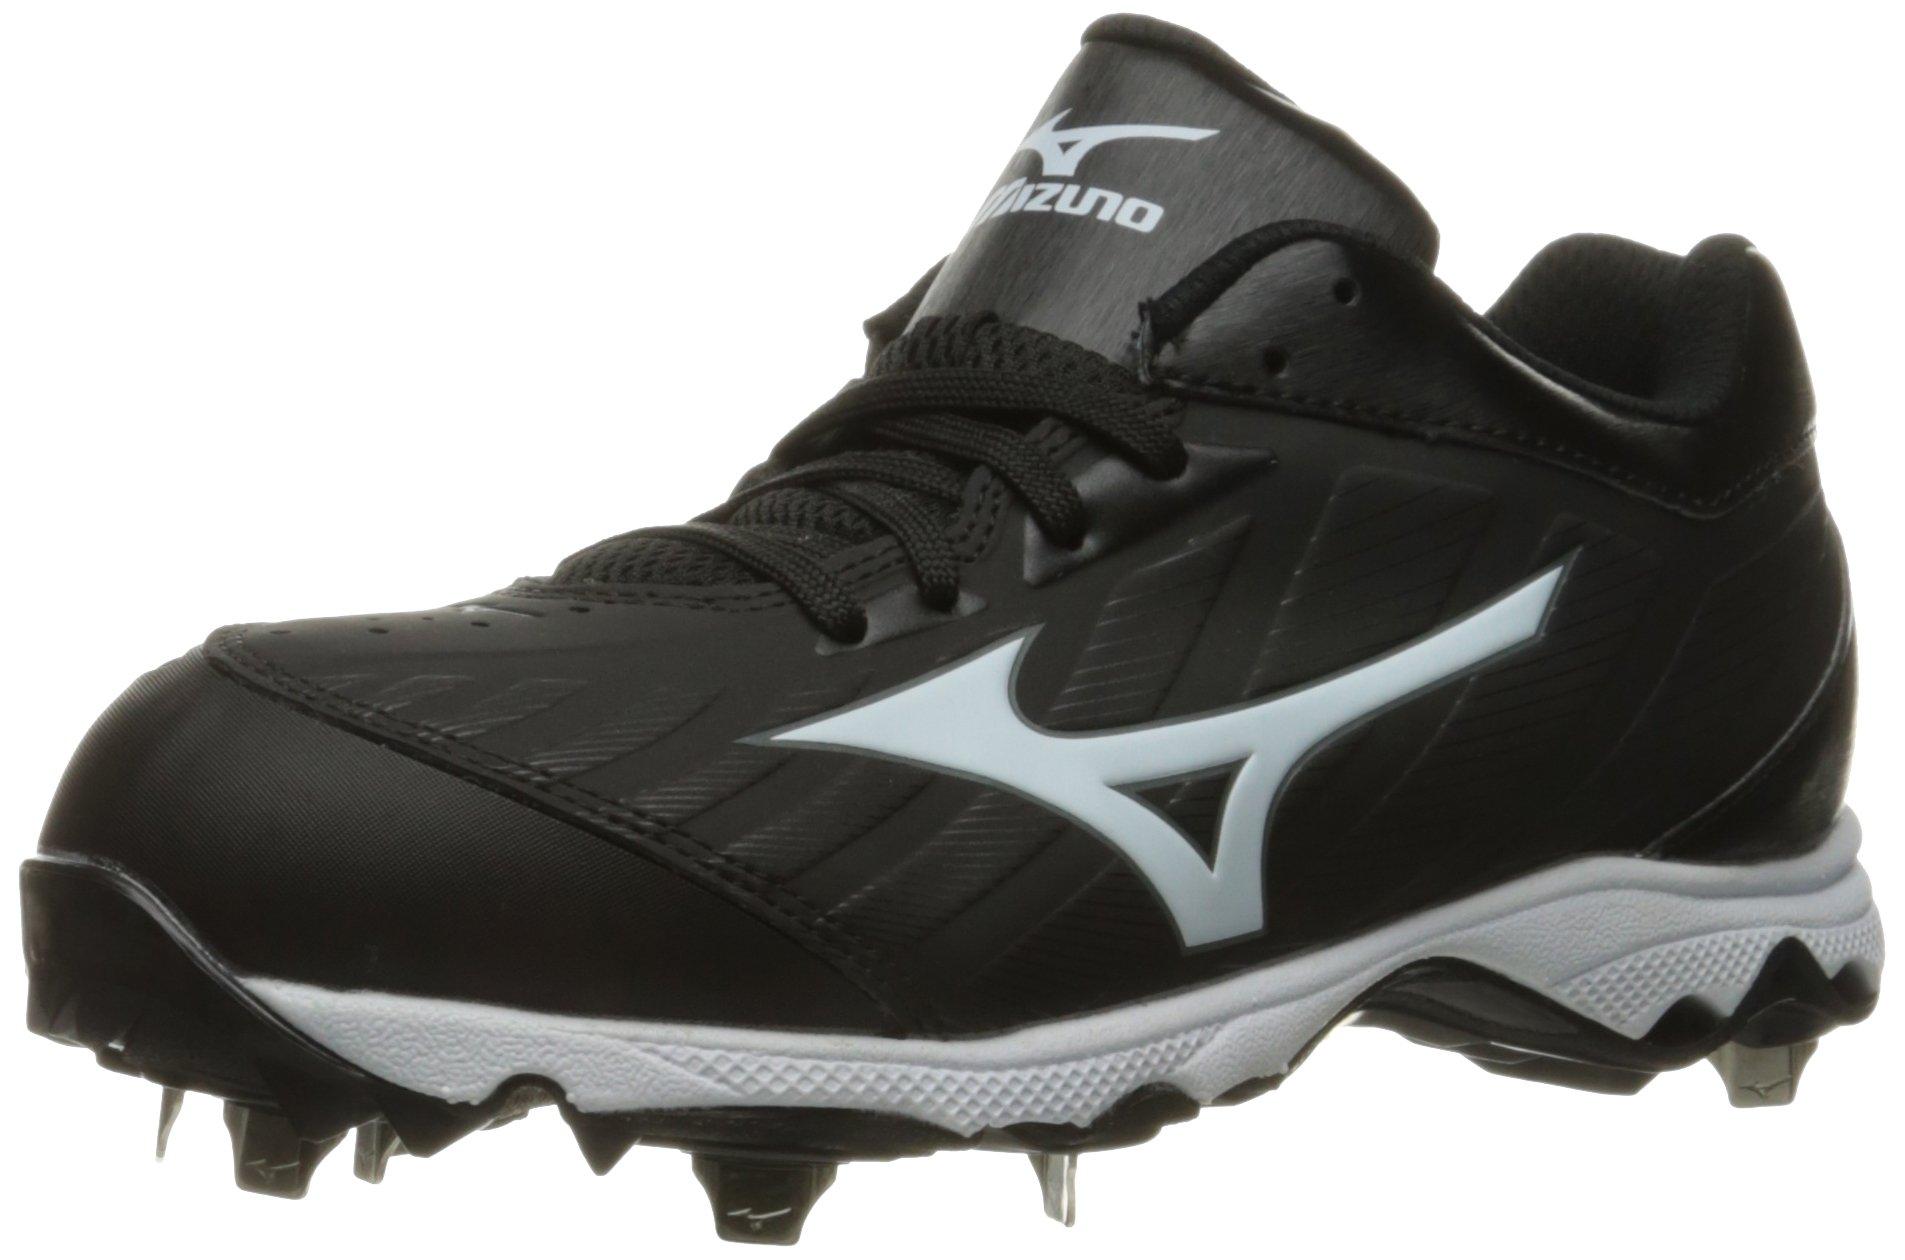 Mizuno Women's 9-Spike Advanced Sweep 3 Softball Shoe, Black/White, 6.5 D US